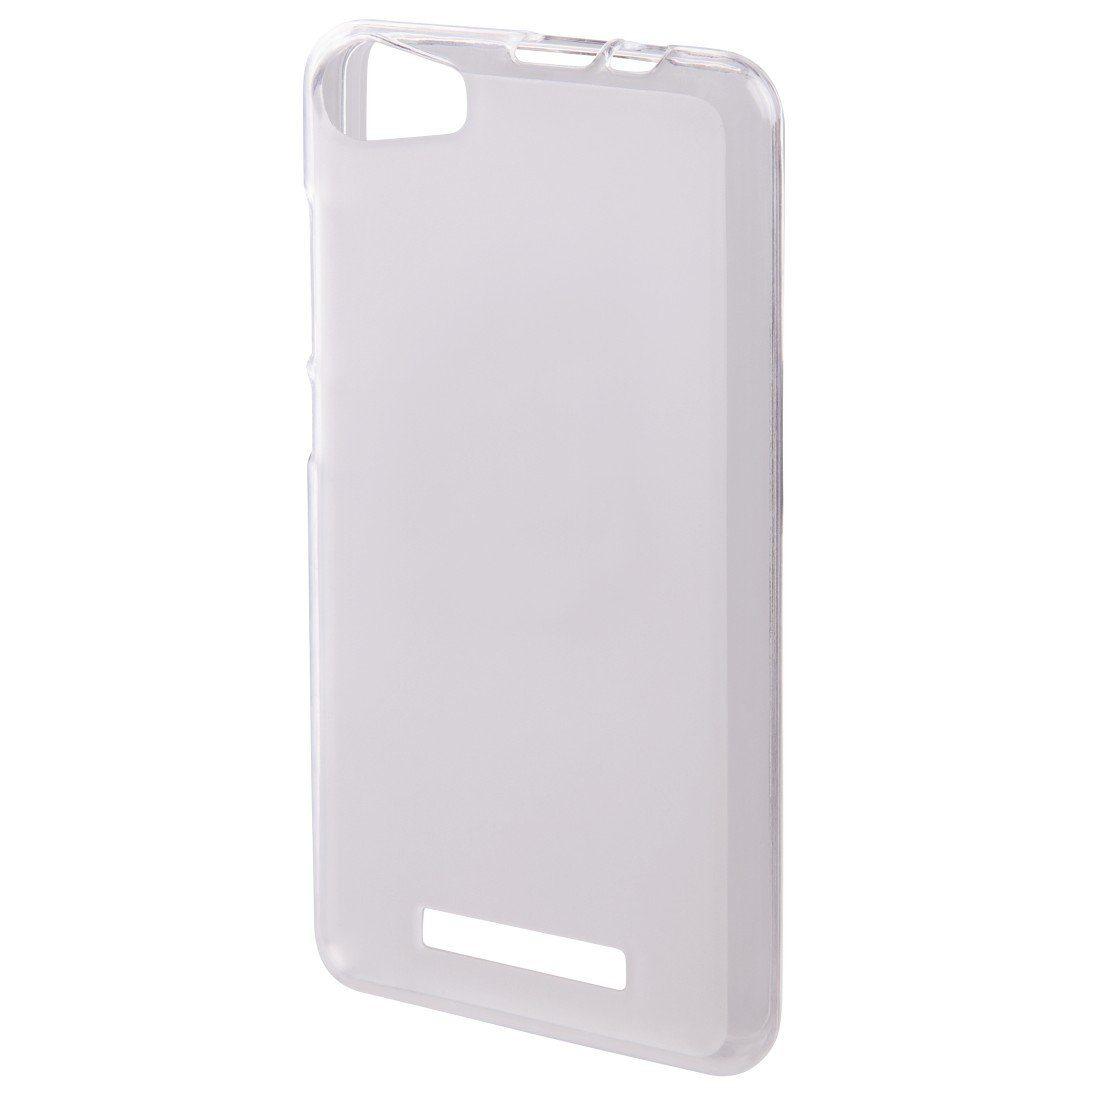 Hama Hülle für Wiko Lenny 2 Case Schutzhülle Handyhülle Bumper »Handy Cover aus flexiblem TPU«